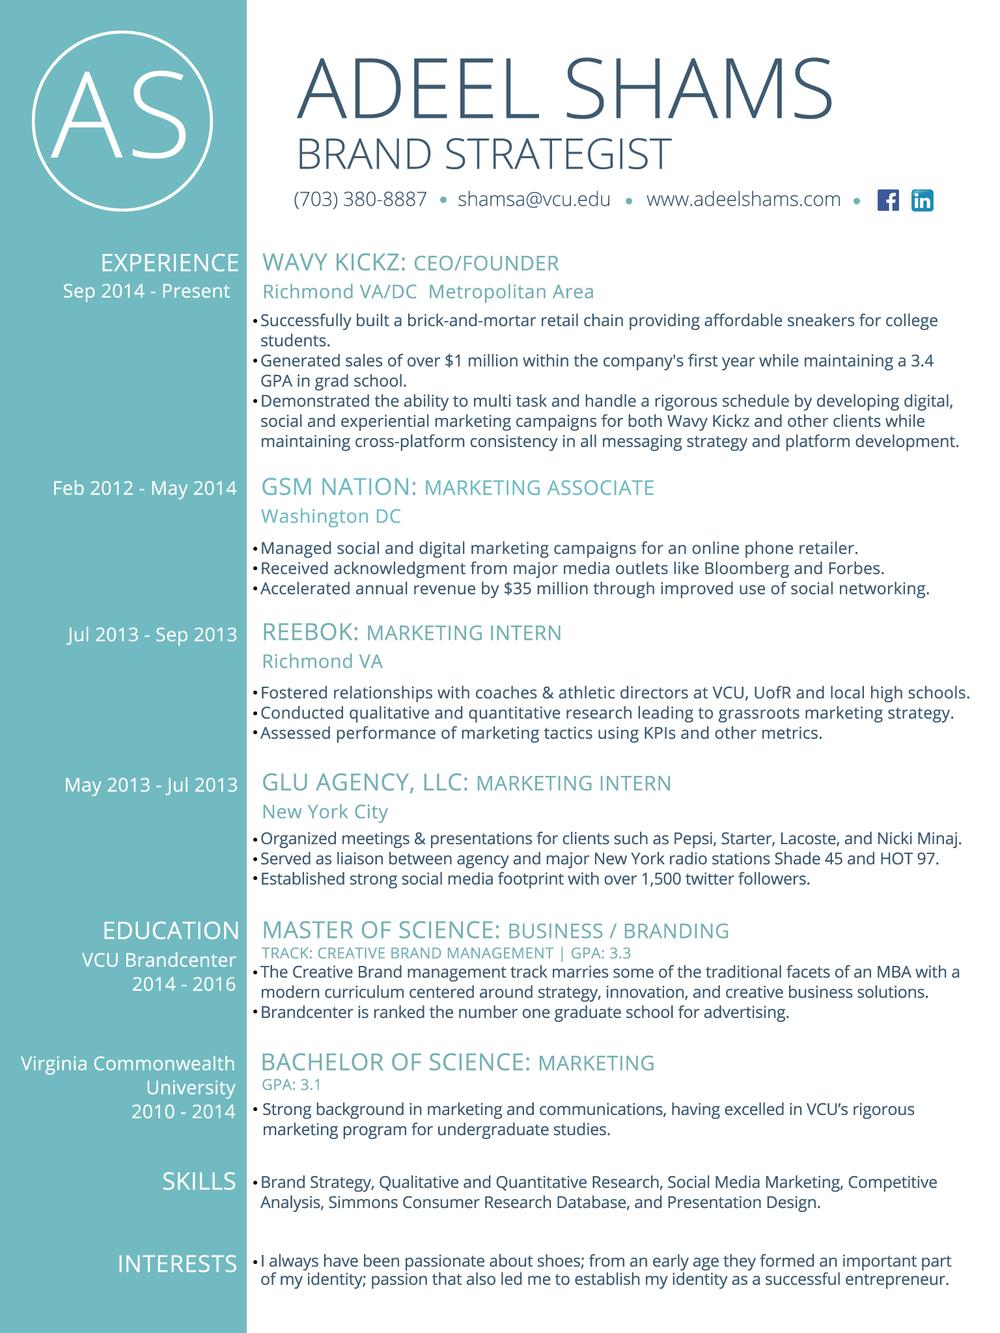 brand strategist - Digital Strategist Resume